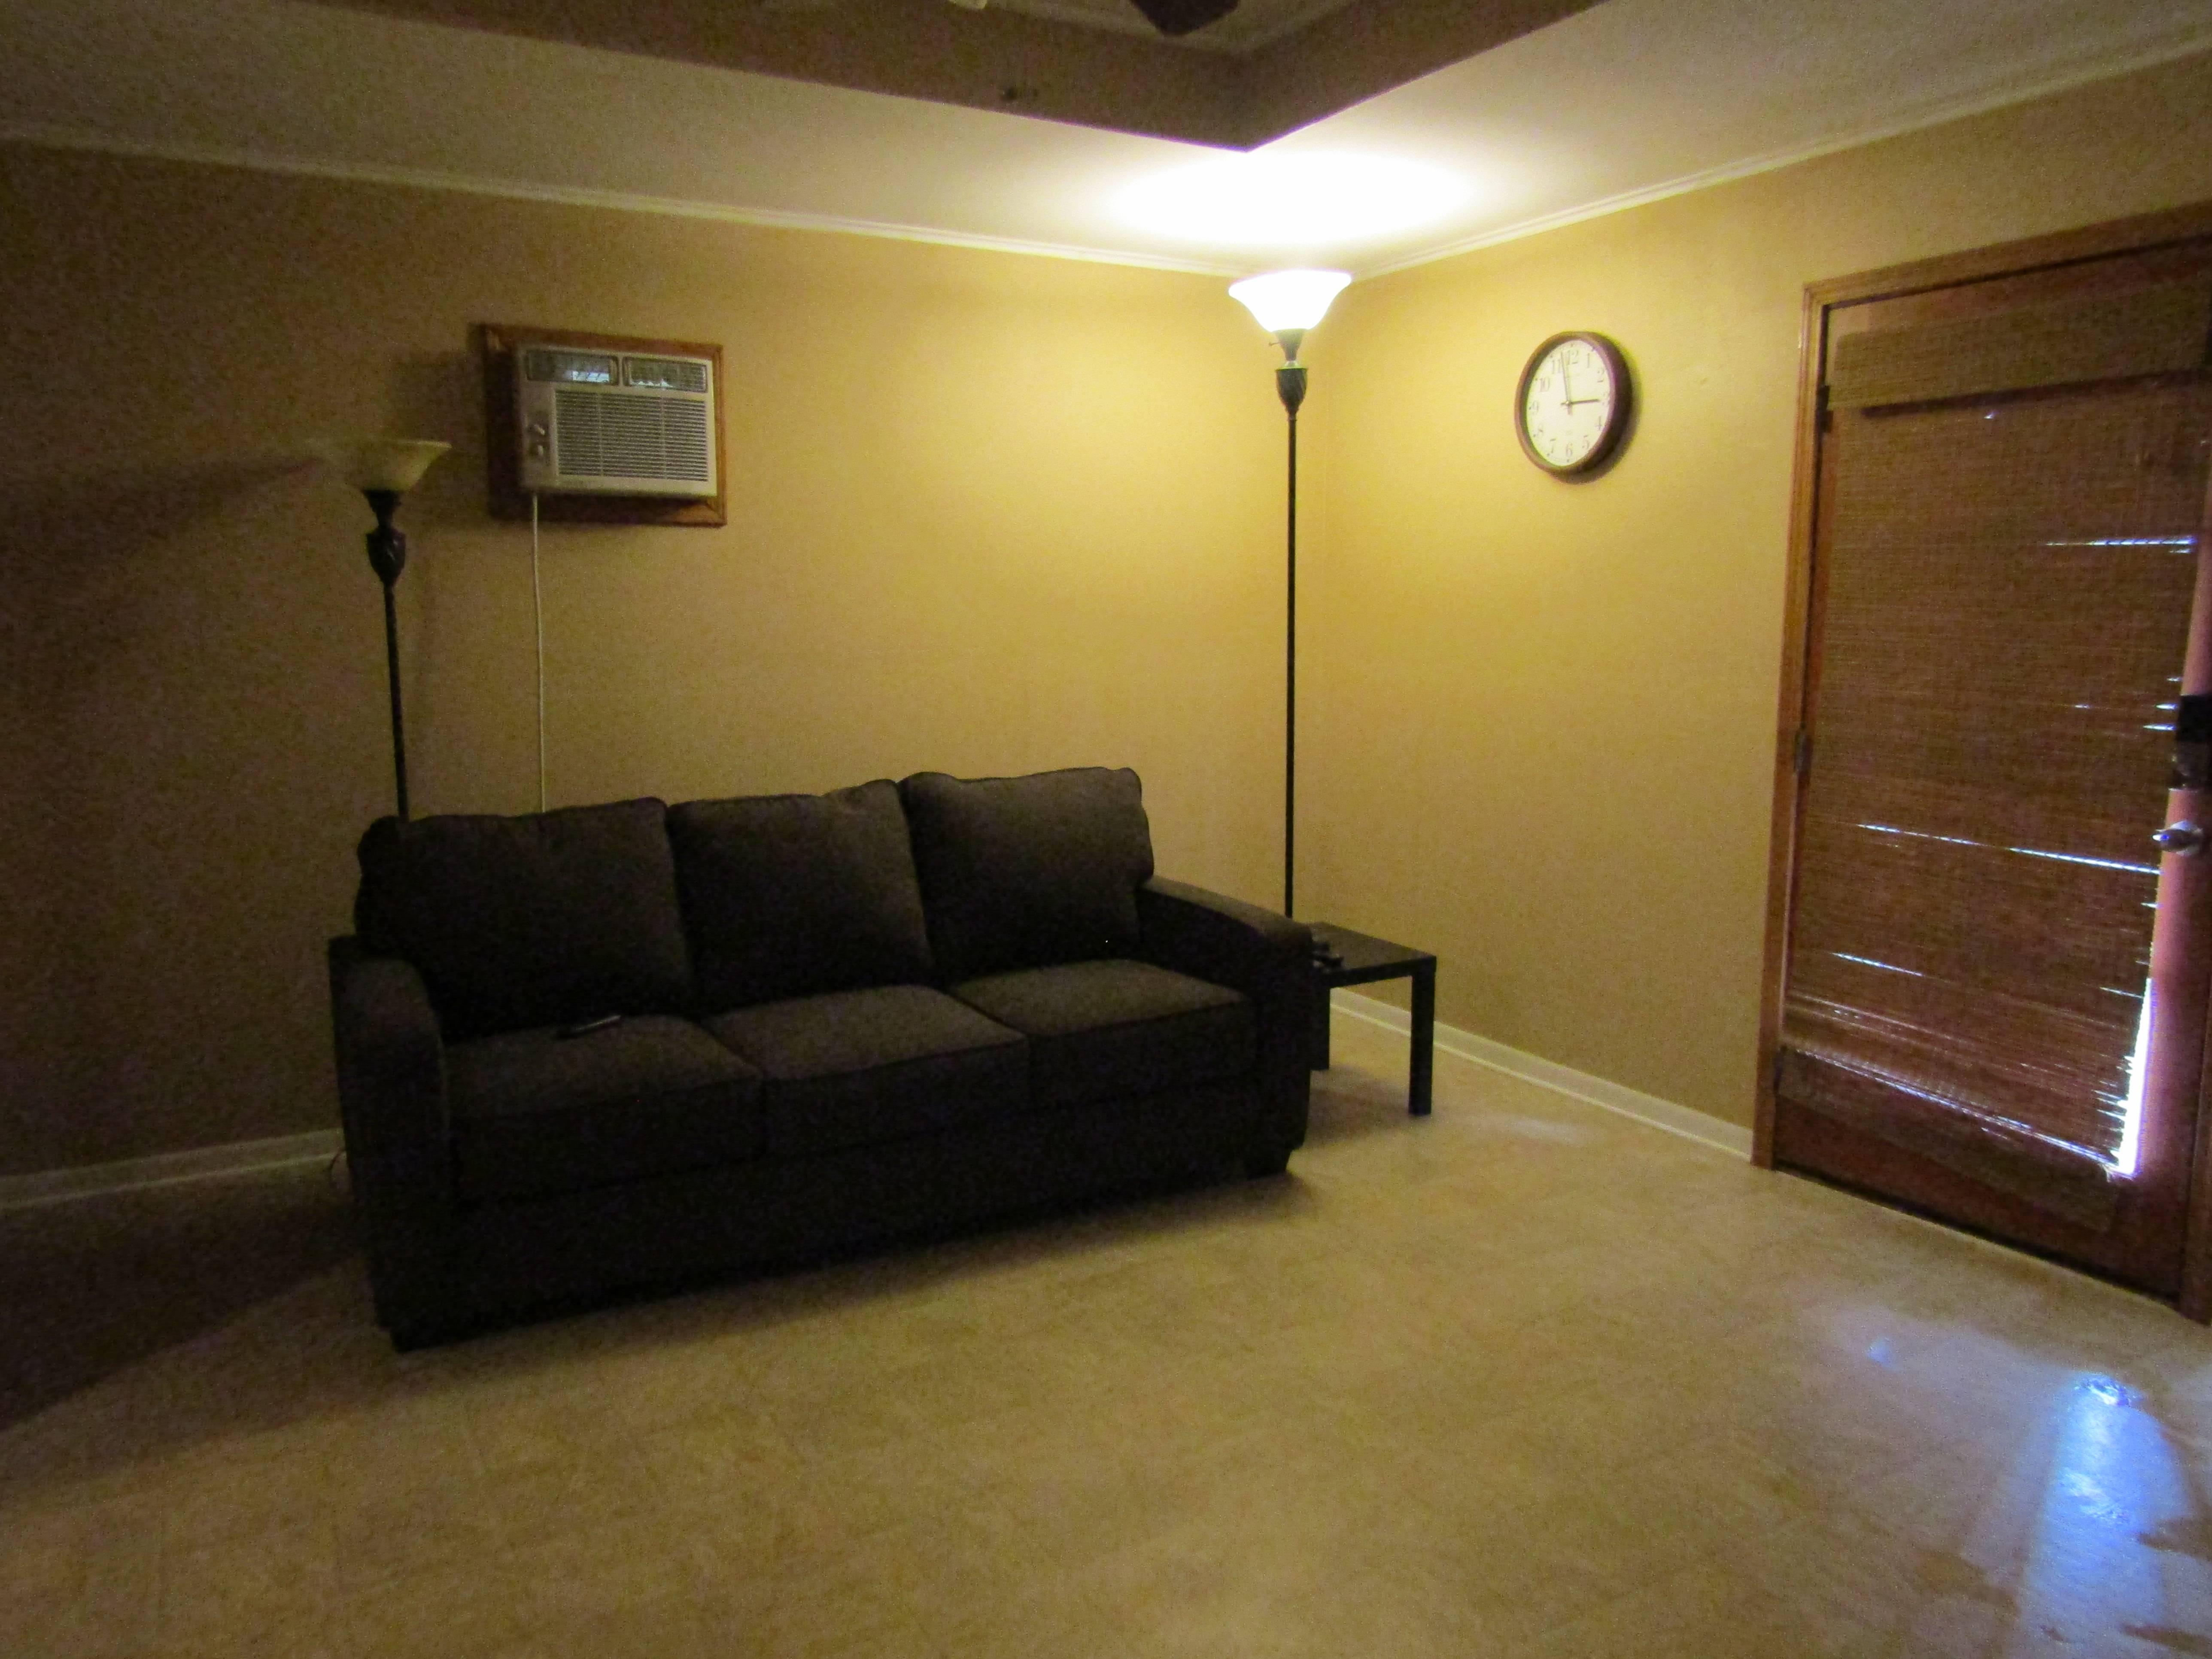 Sofa sleeper in the living room